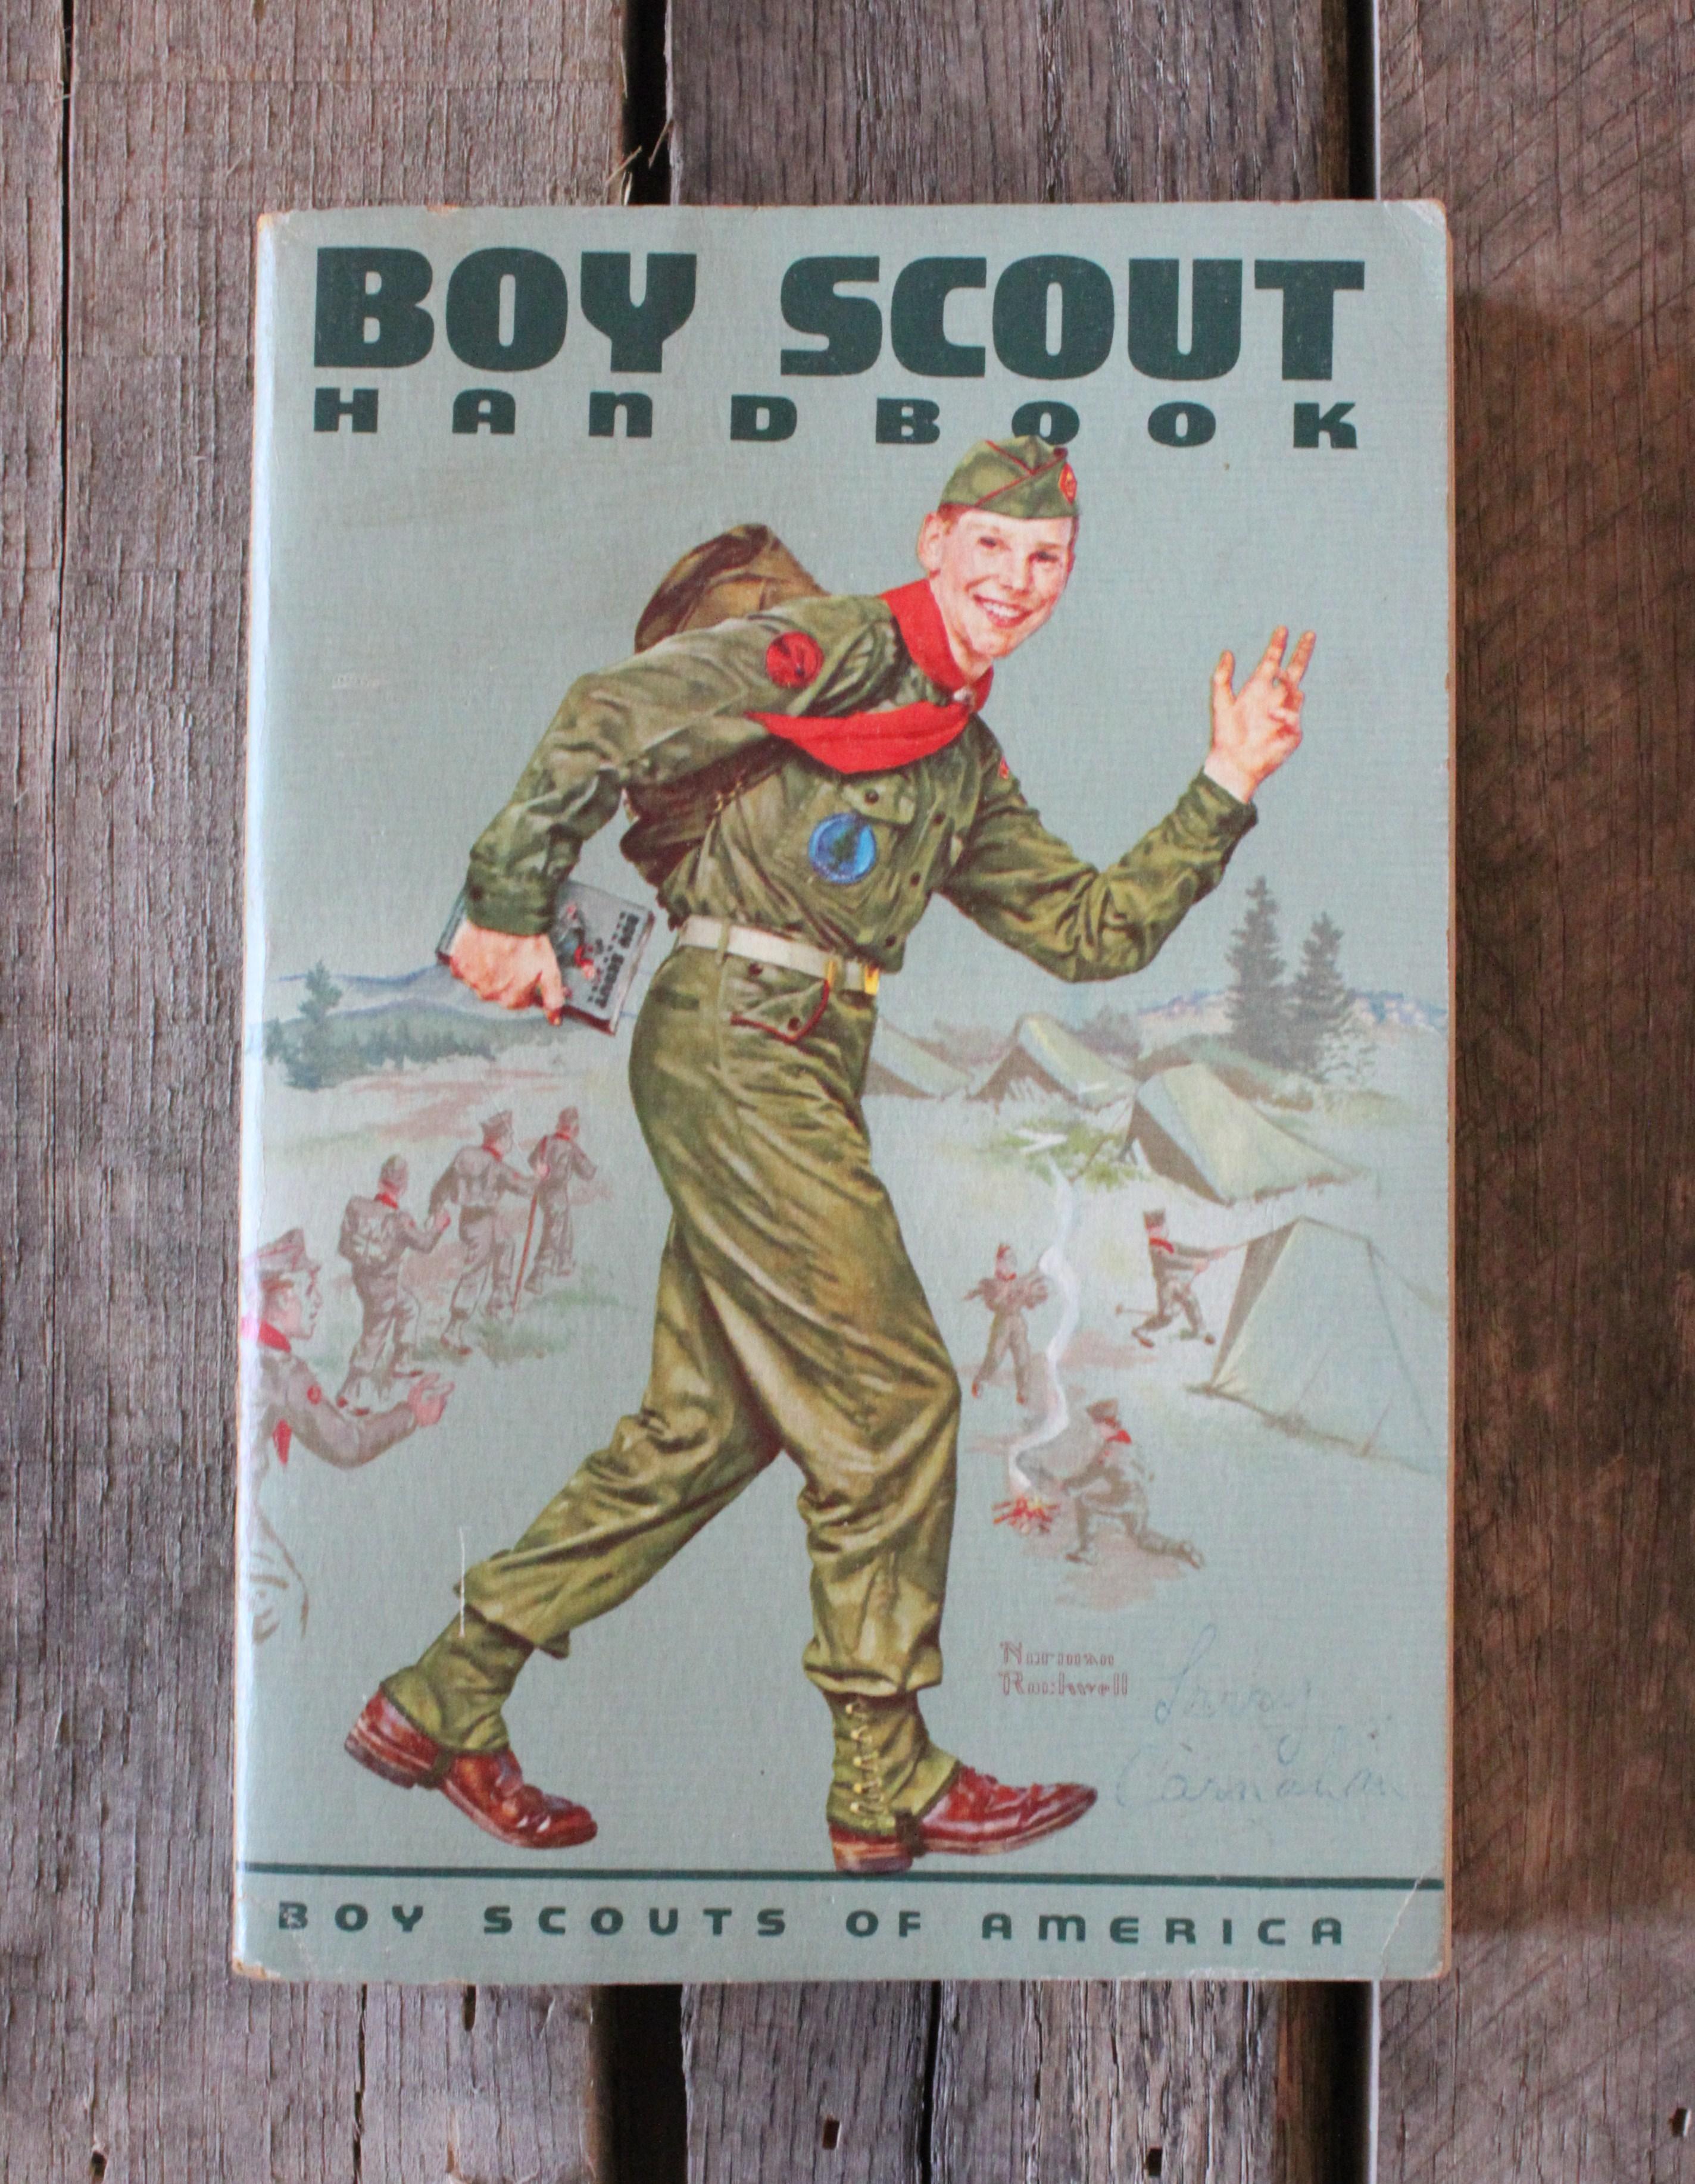 Boy scout of america handbook